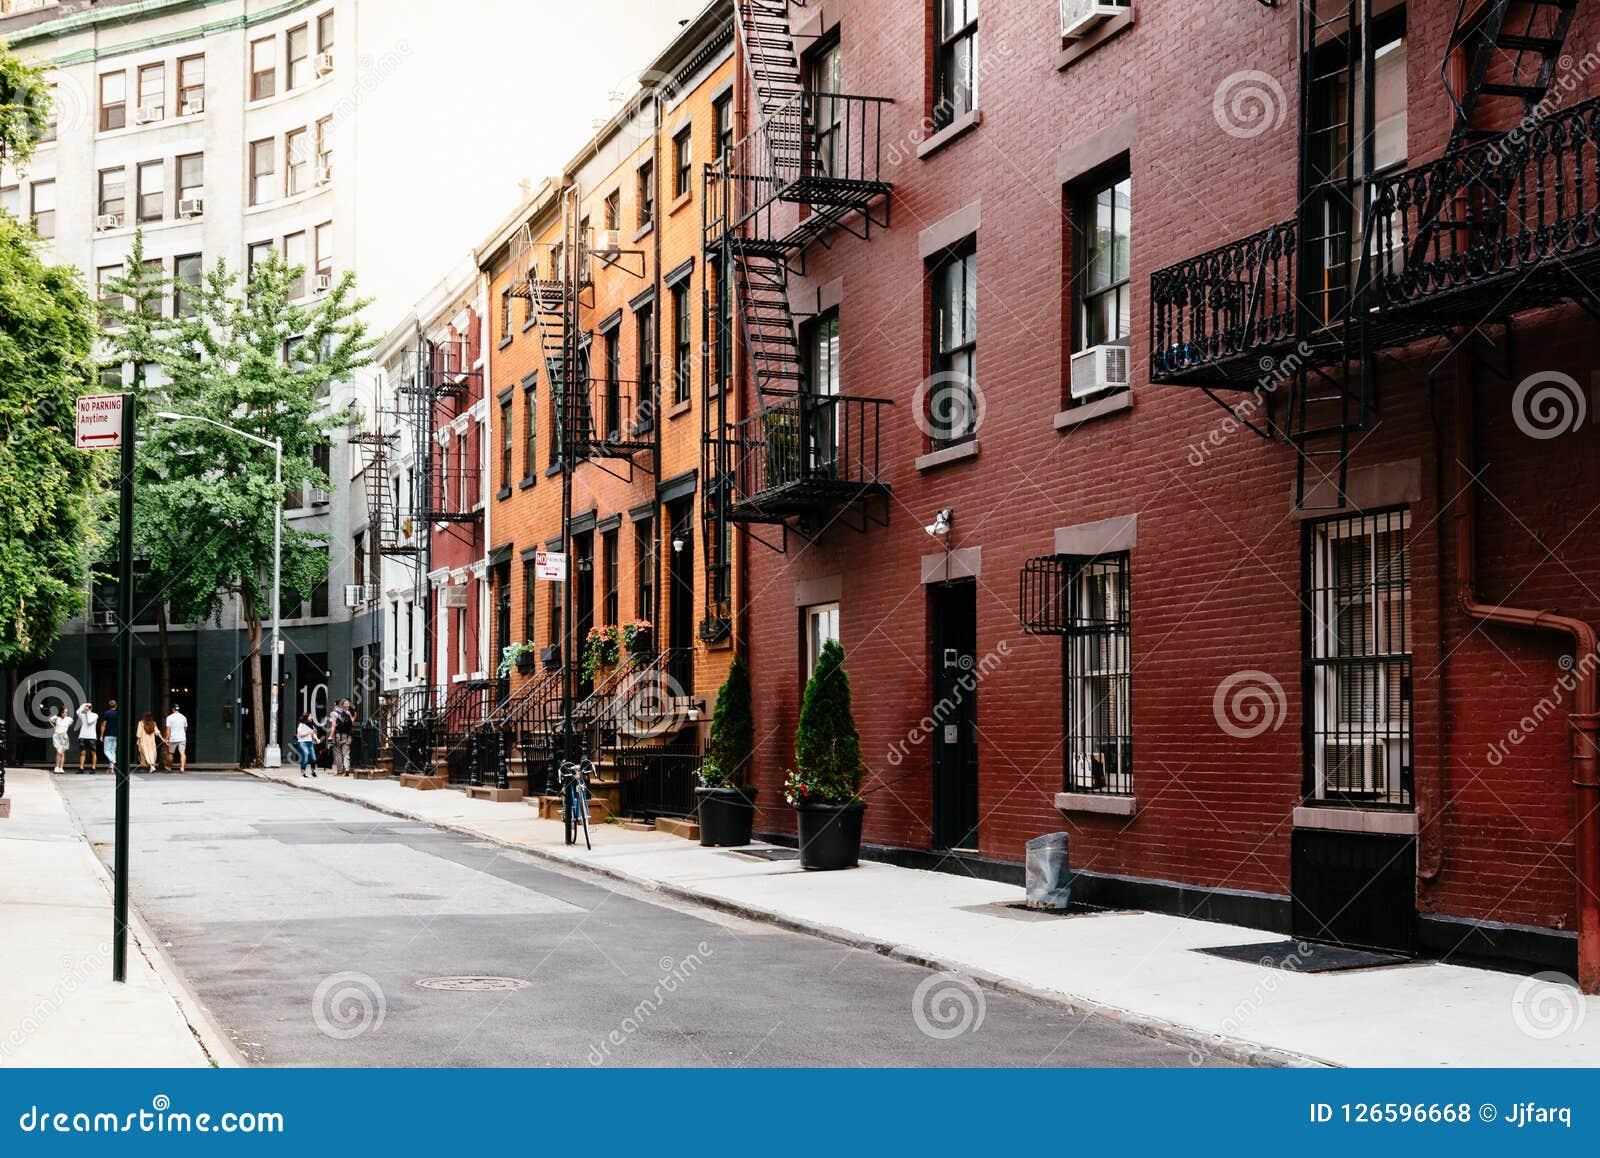 Opinião pitoresca da rua no Greenwich Village, New York Fotos de Stock Royalty Free